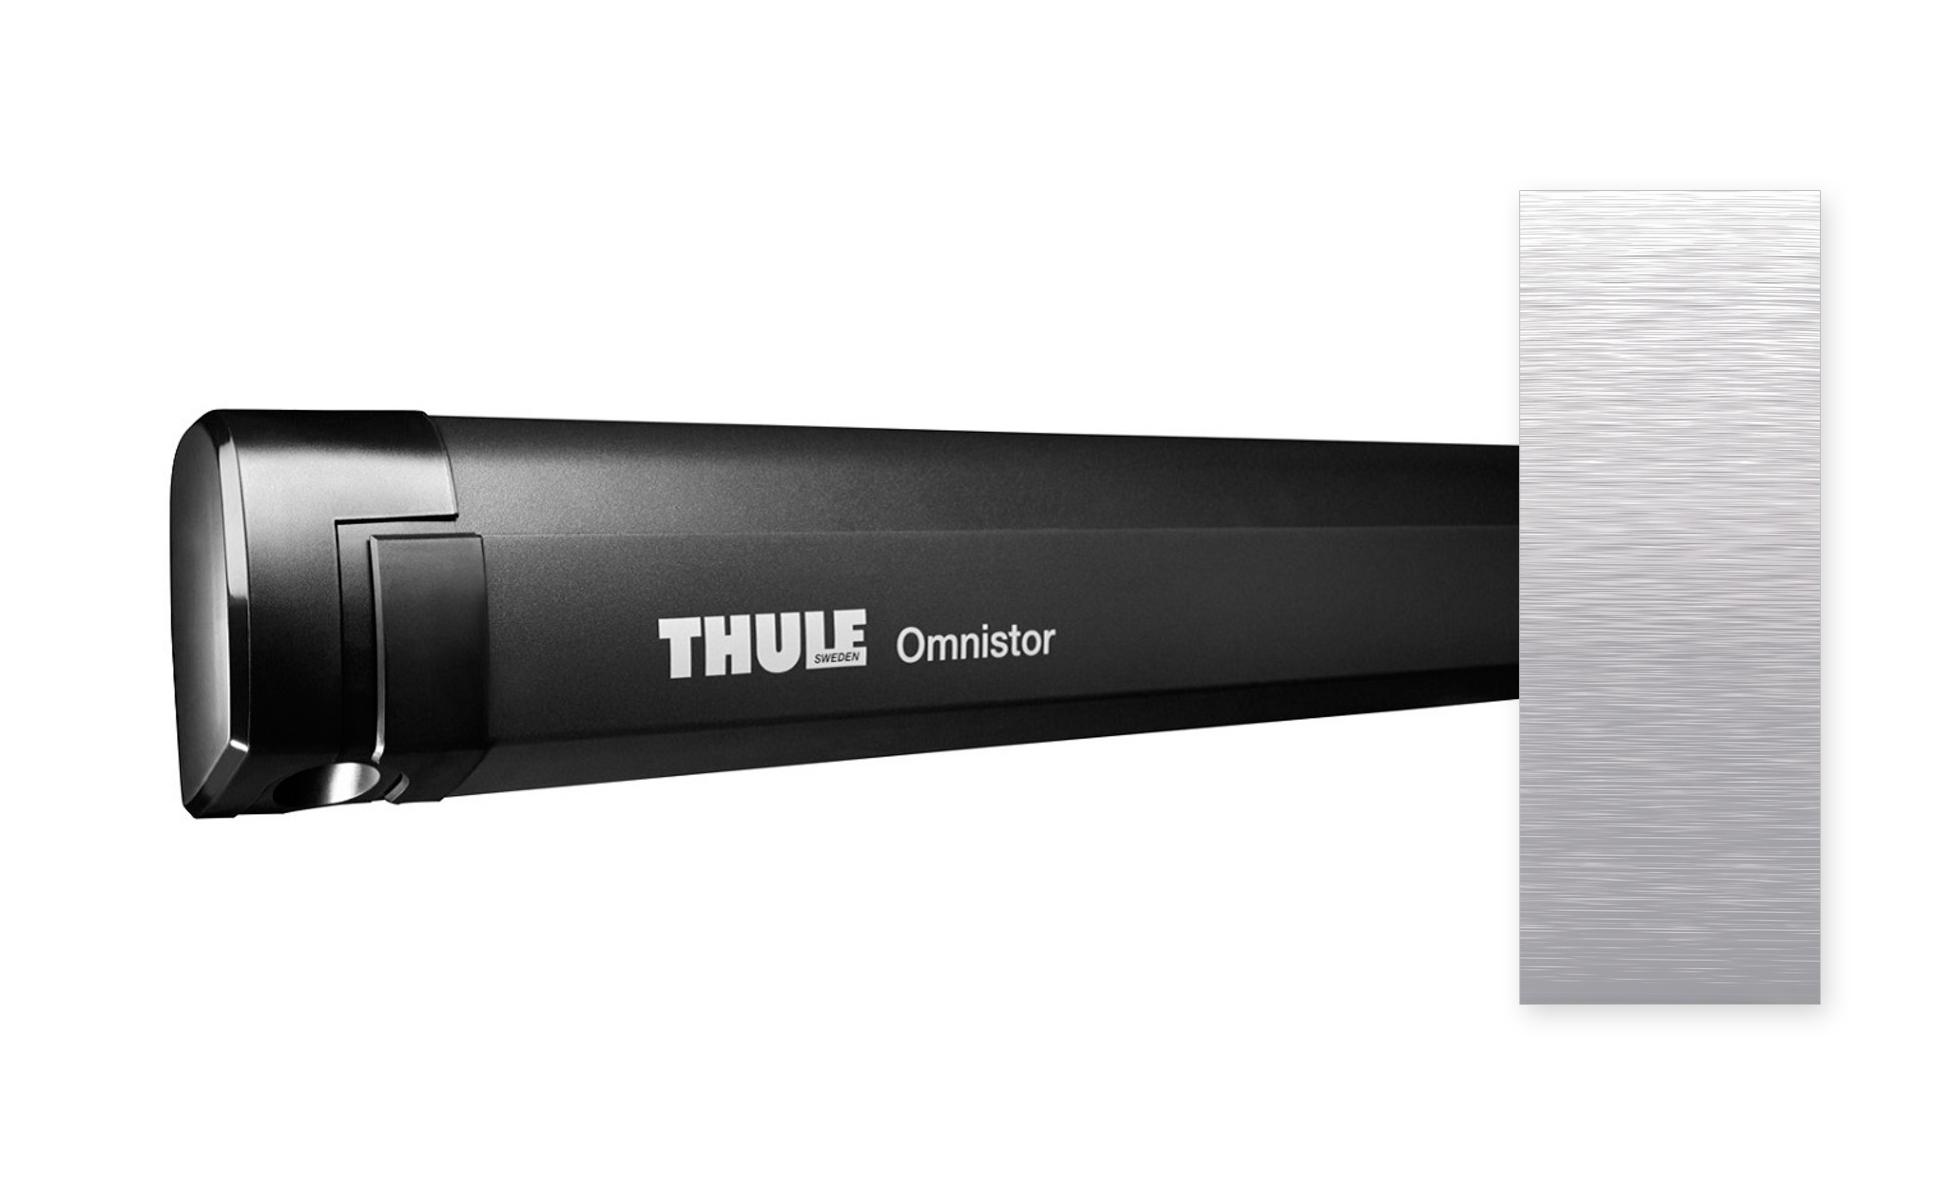 Thule Omnistor 5200 anthrazit 315x250 cm, Mystic Grau